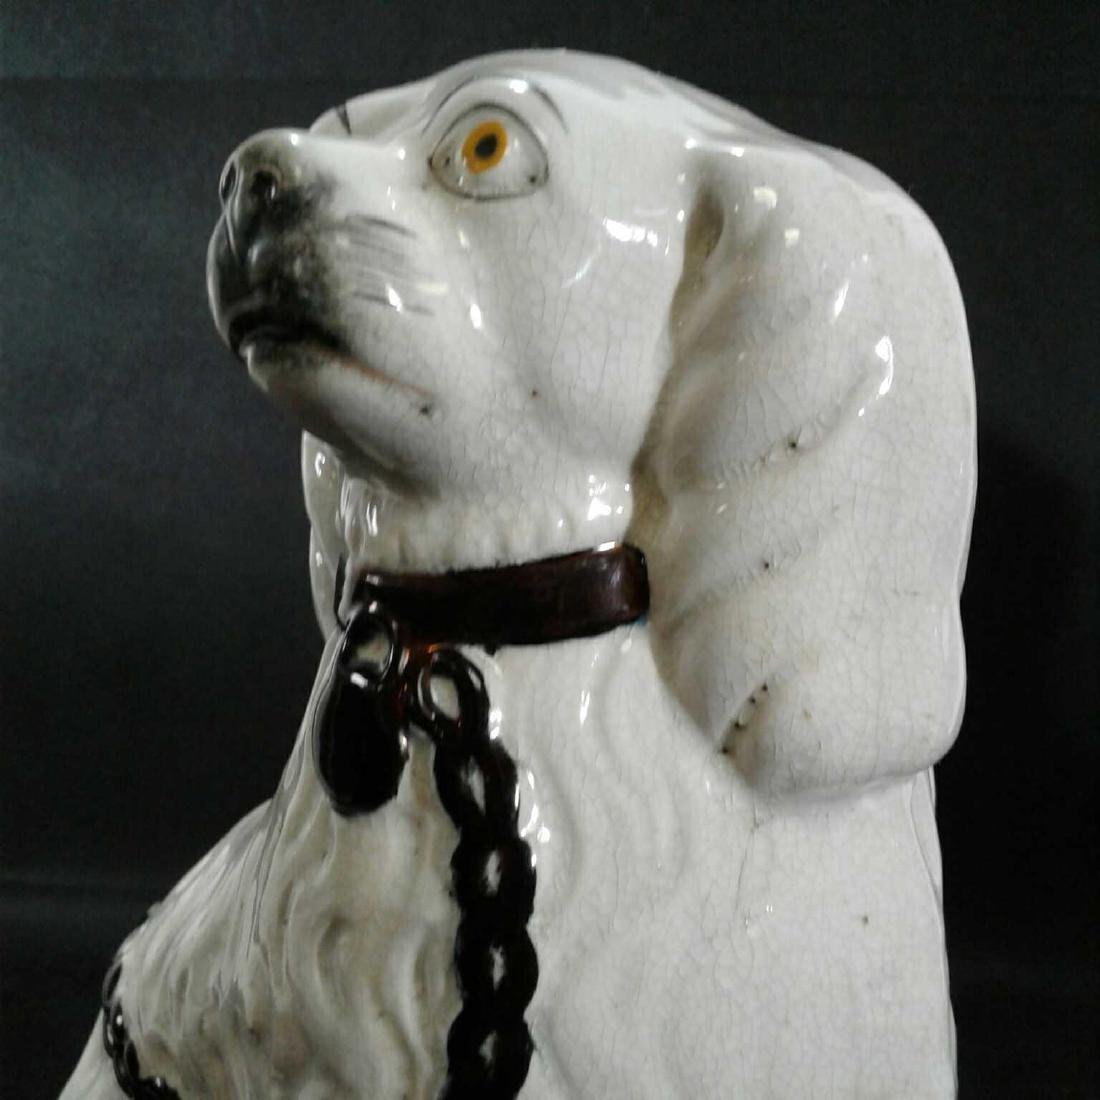 2 Staffordshire Porcelain White Spaniel Dogs Figurines - 4